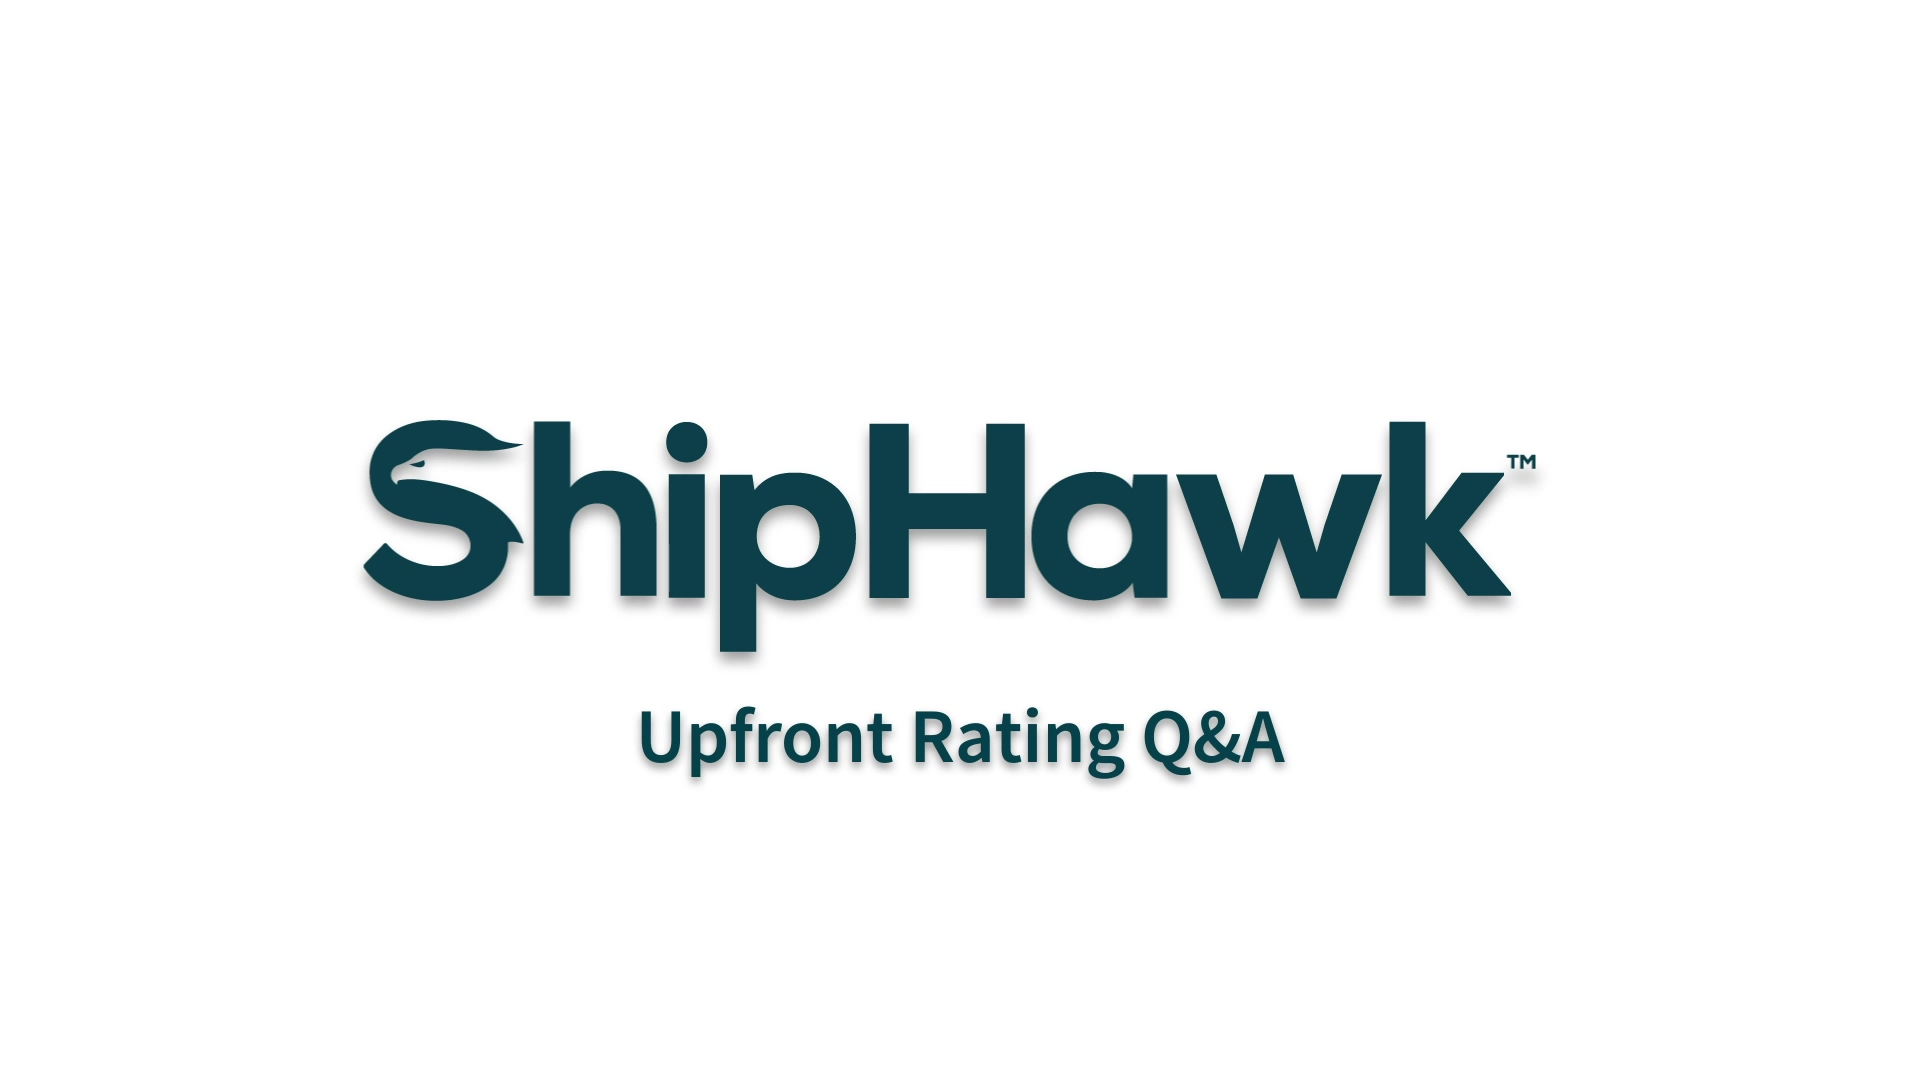 (1) Upfront Rating